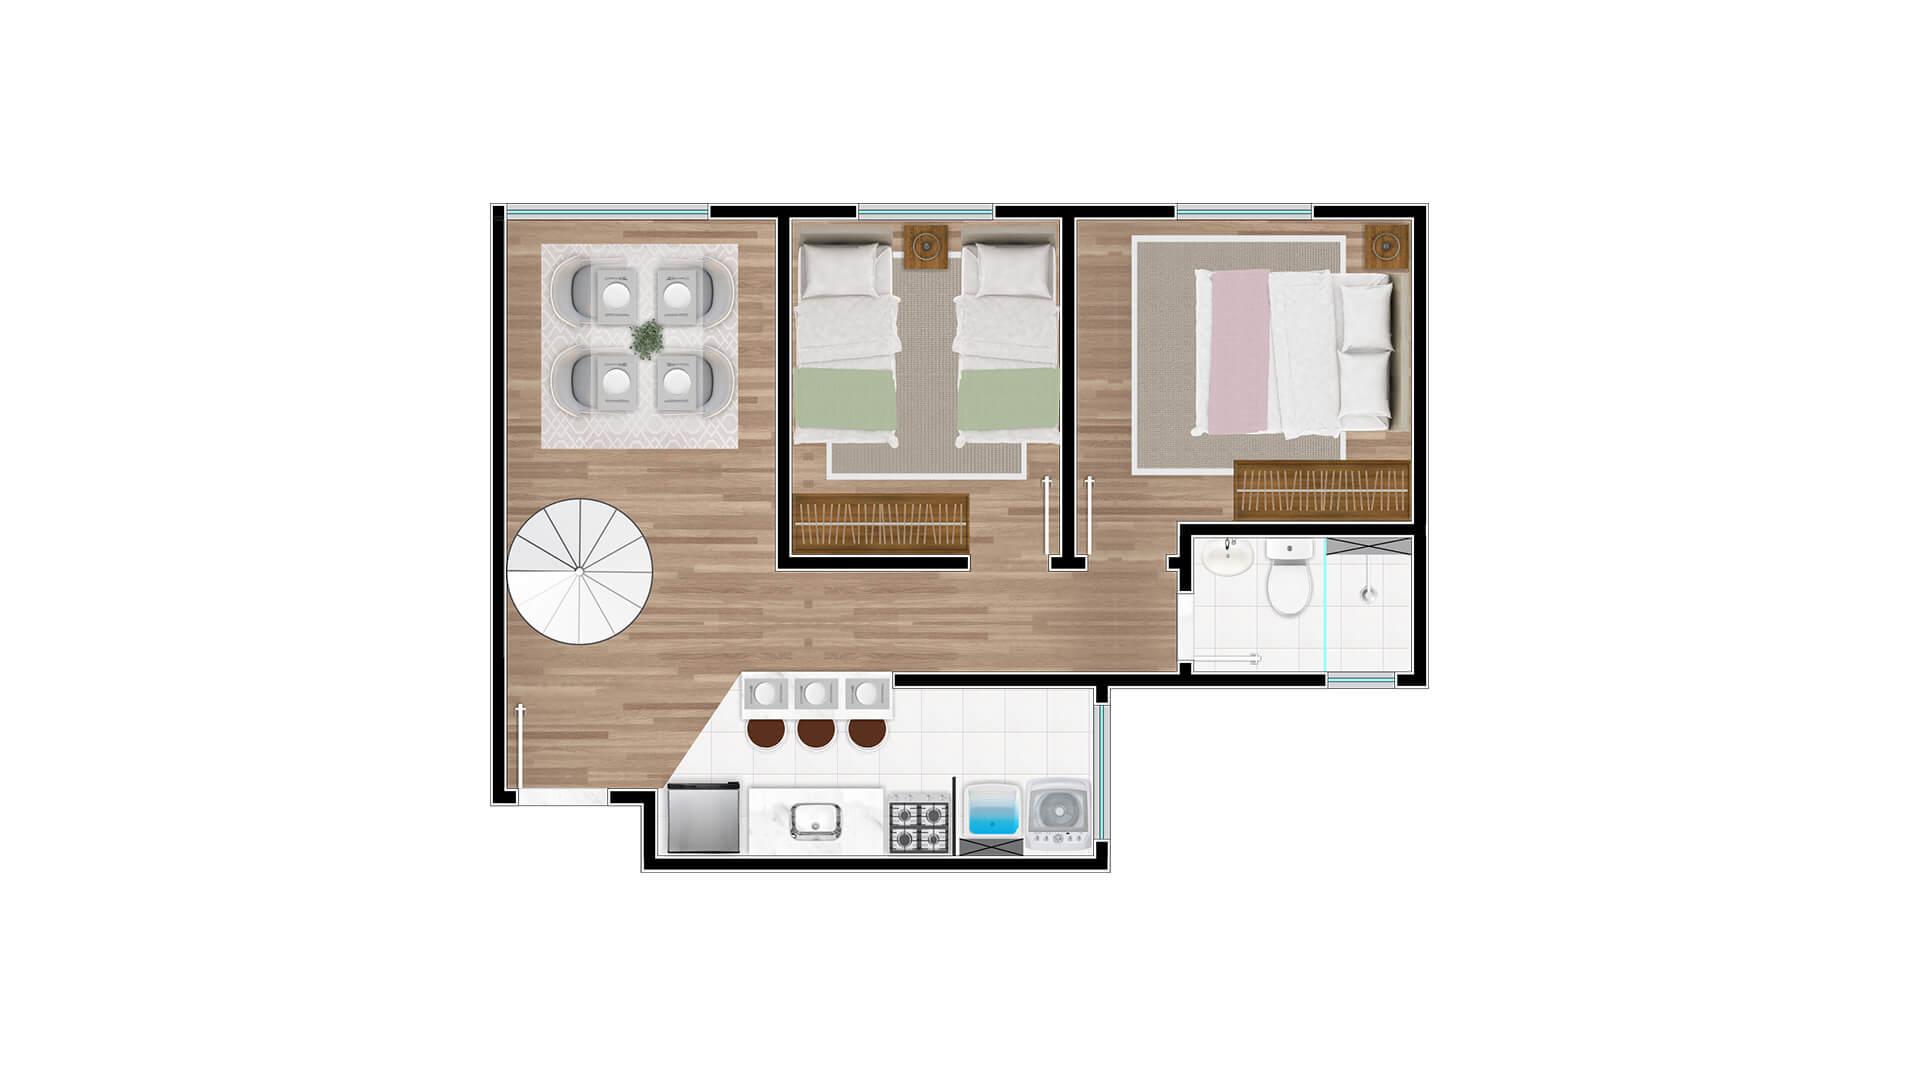 Cobertura Tipo 2 - 1º andar - Millennium Residence